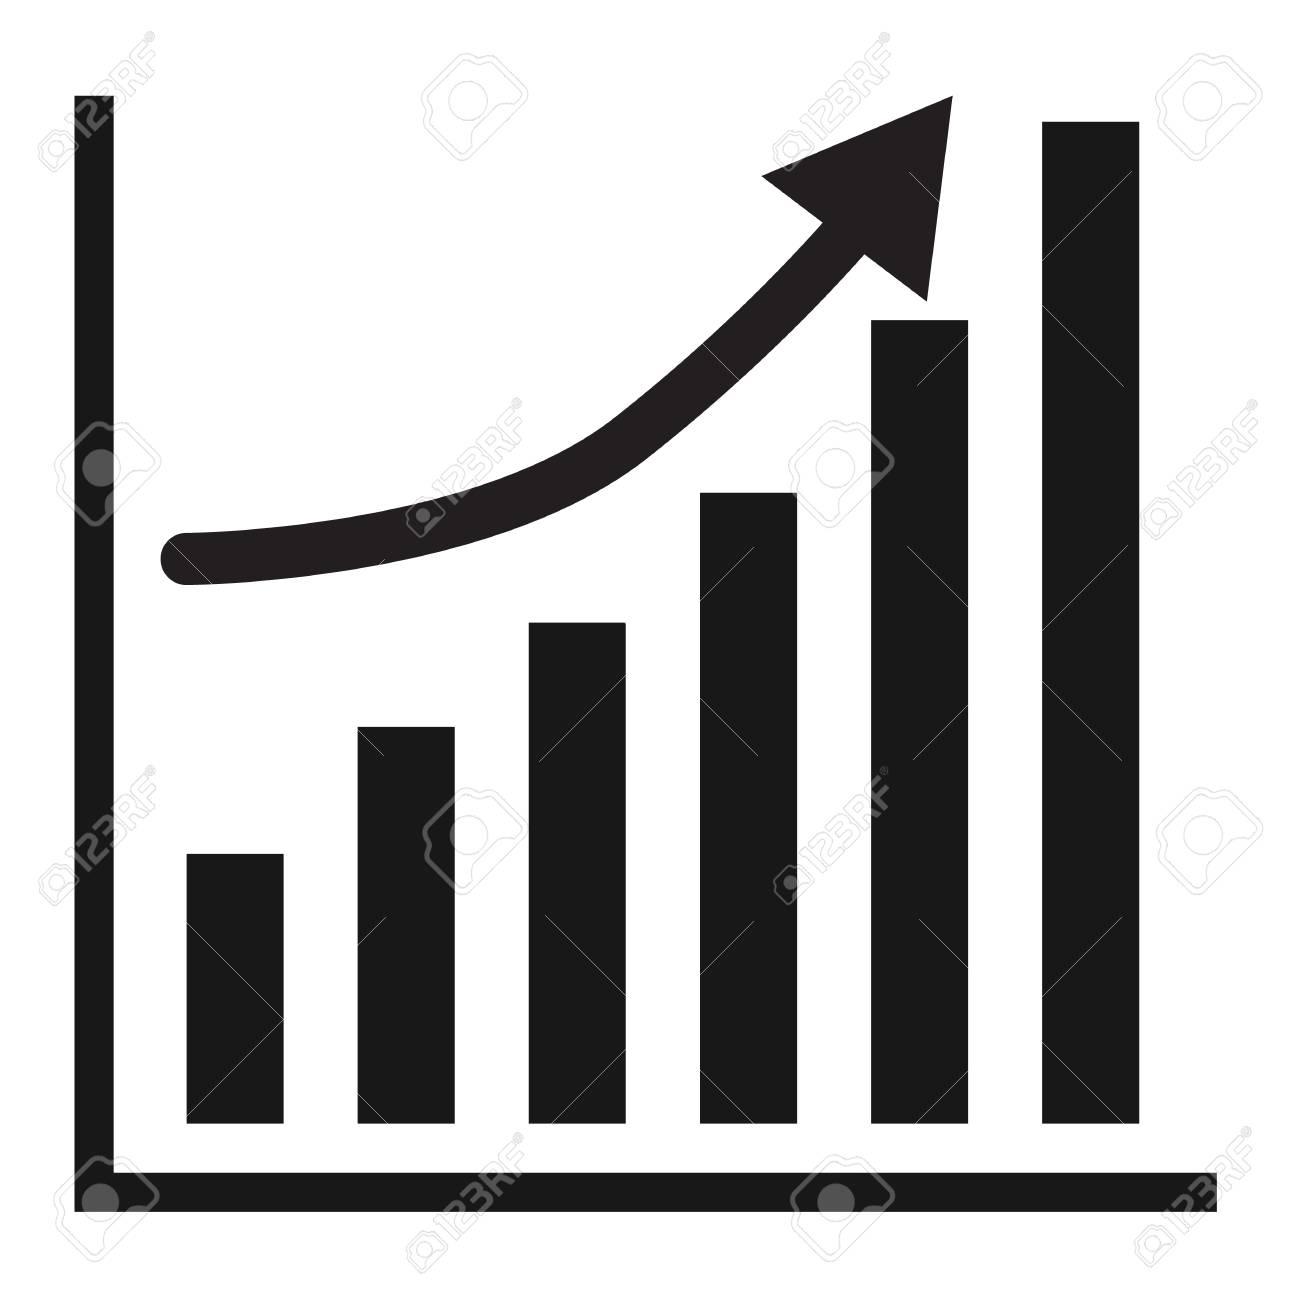 Business Graph Vector Growth Progress Black Arrow